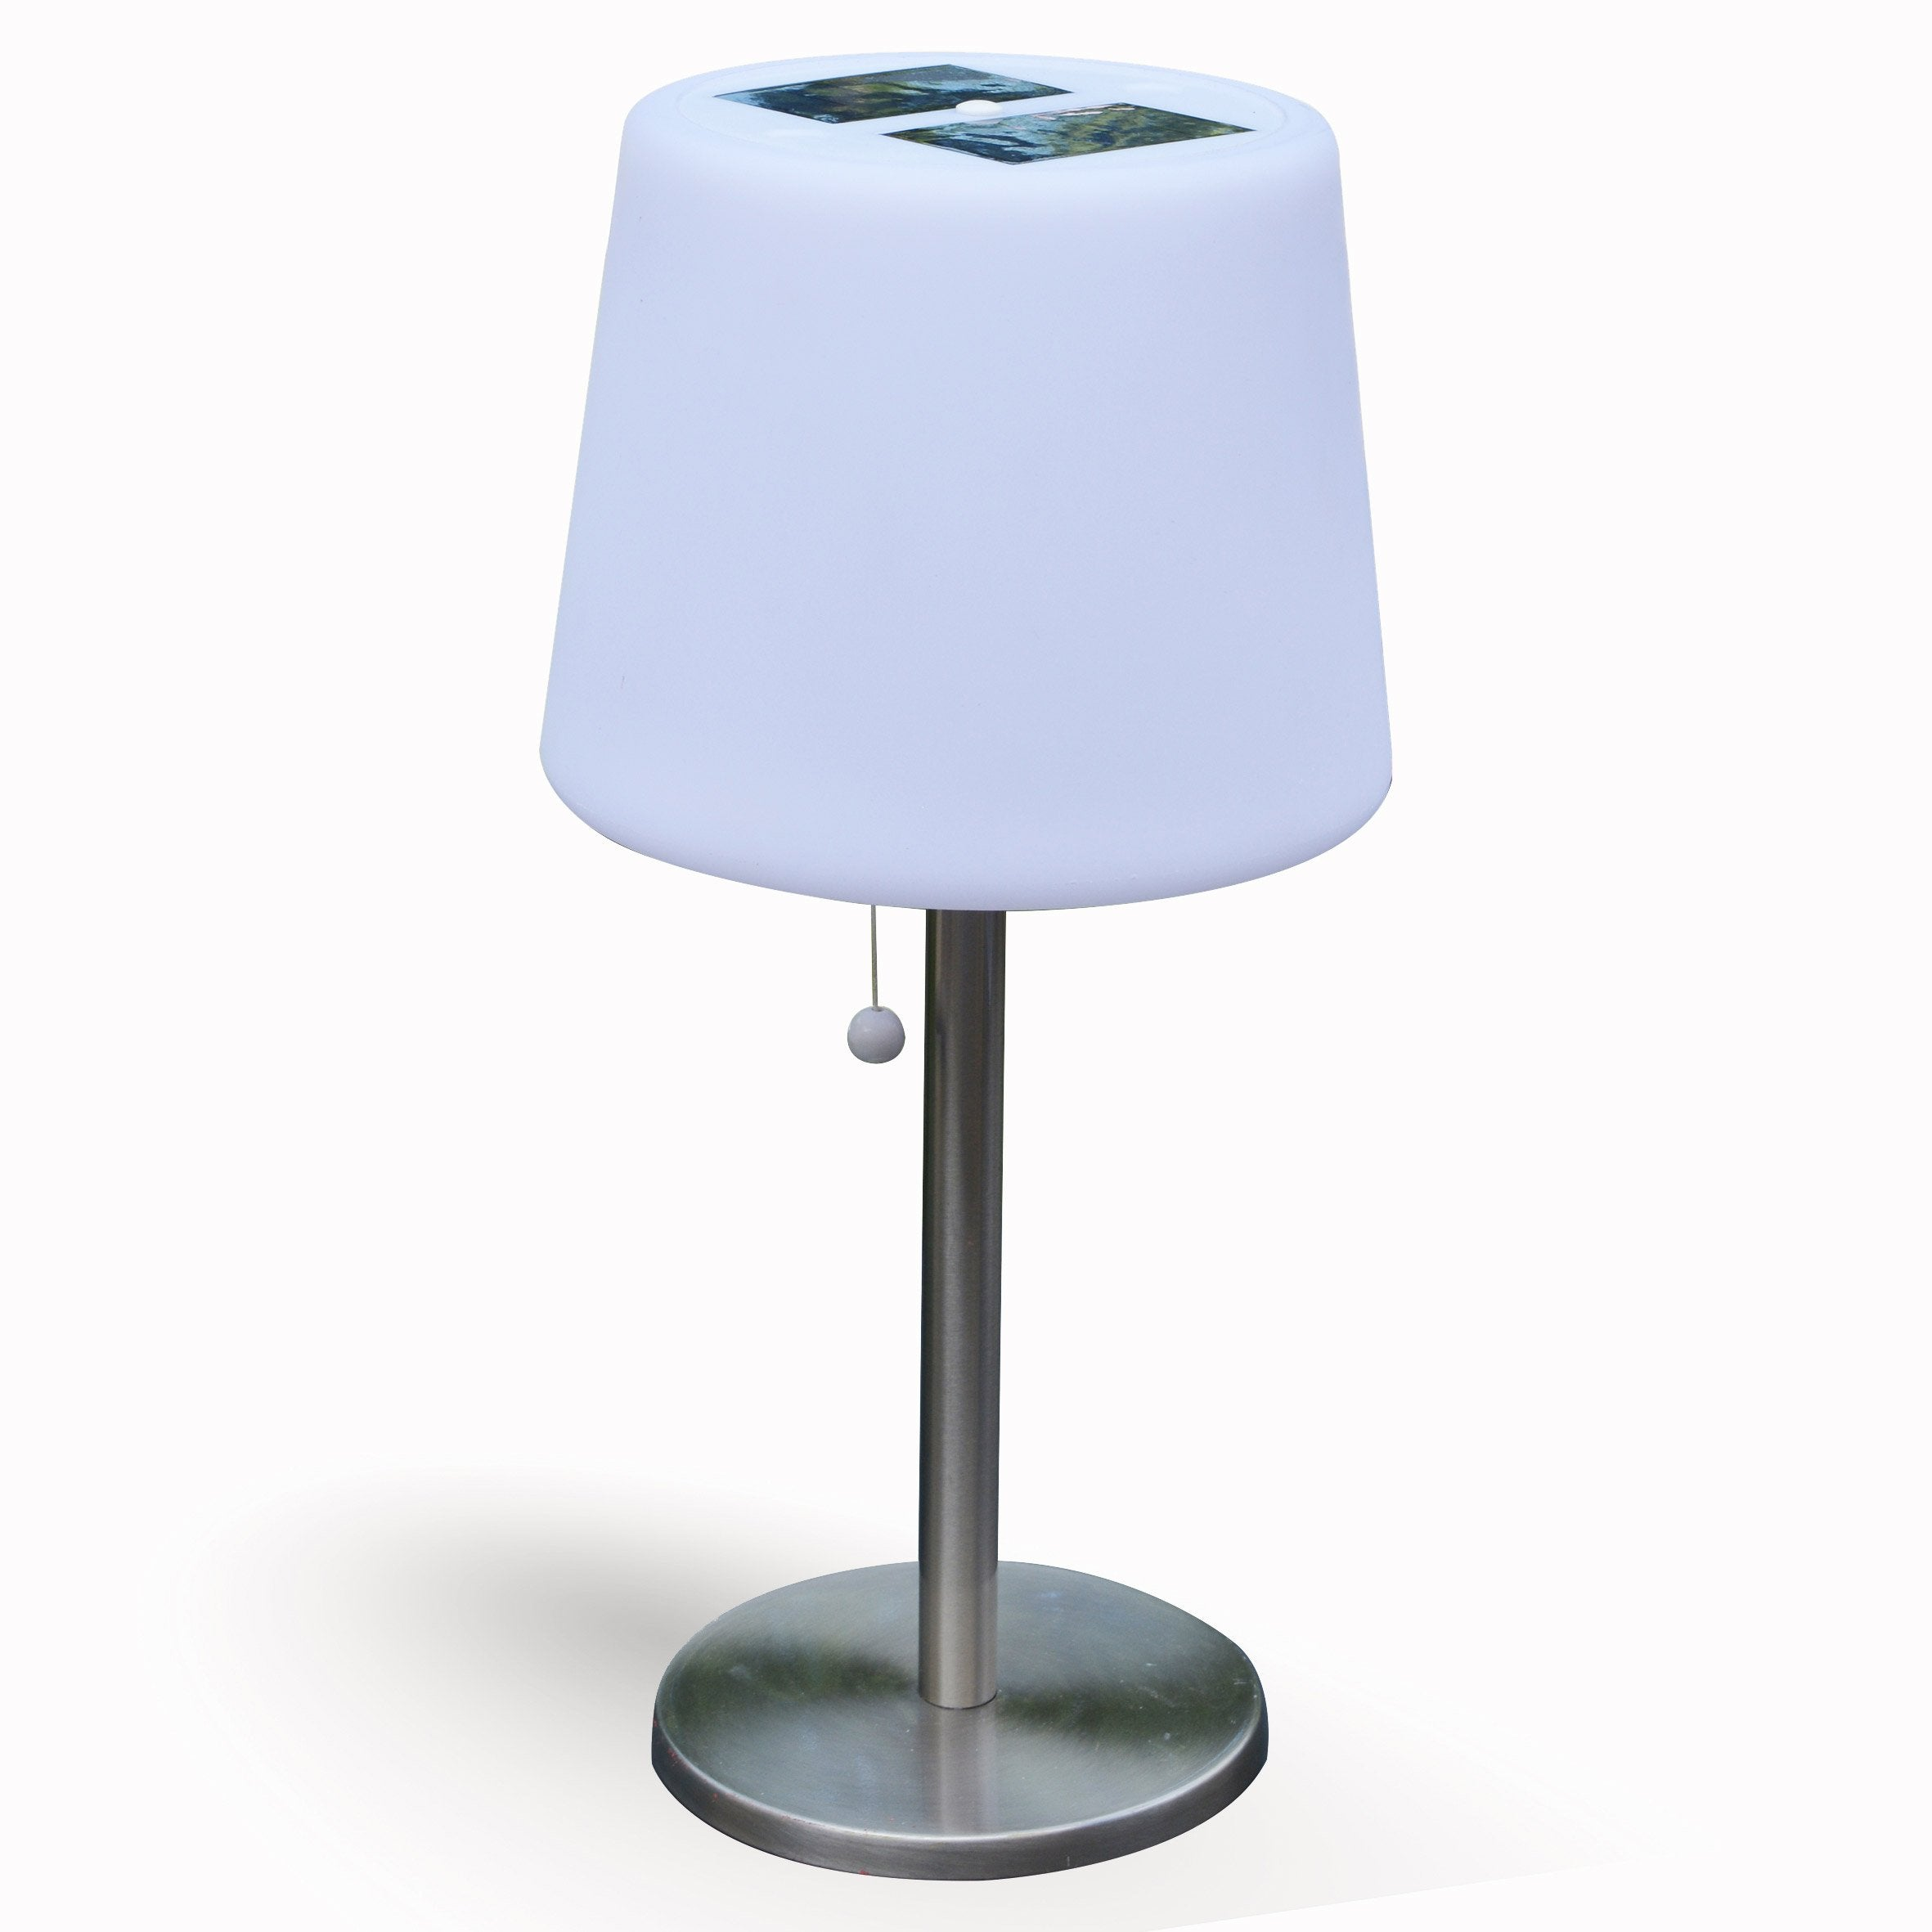 Lampe PrixLeroy Solaire Au Meilleur Merlin WHE29DI